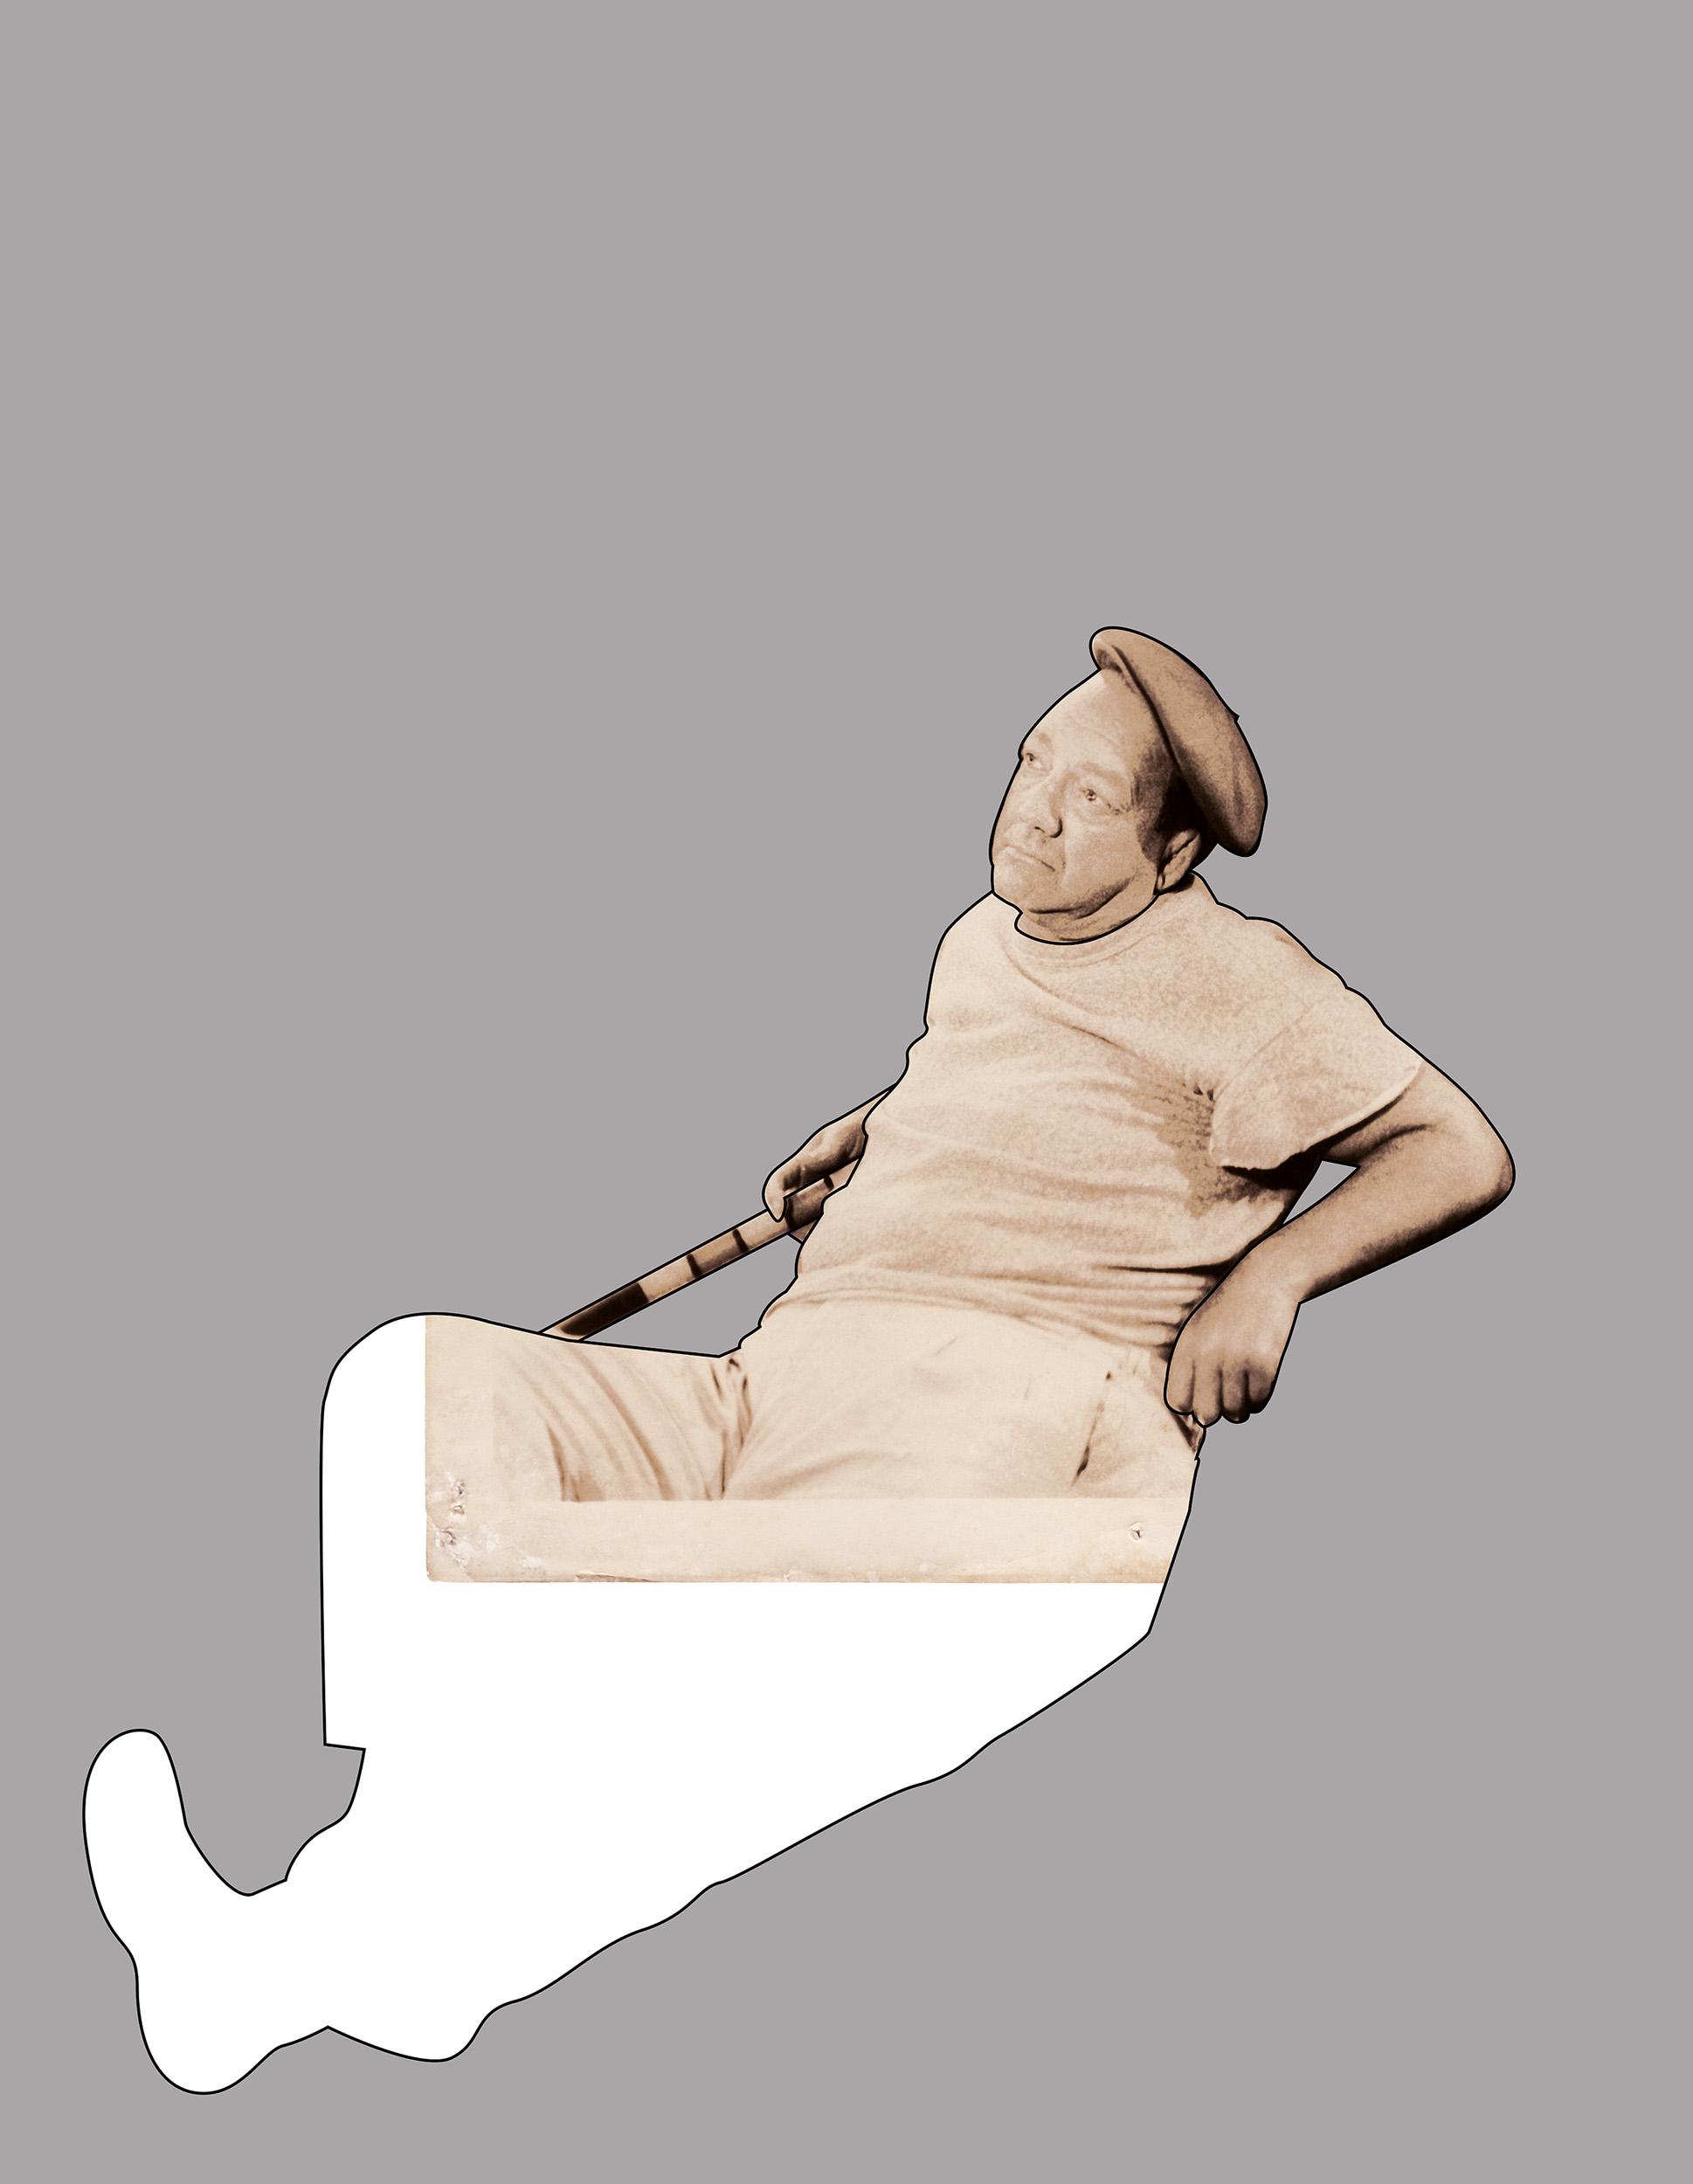 Reclining Man  2005, colour photograph,76 x 58 cm / 30 x 23 in.